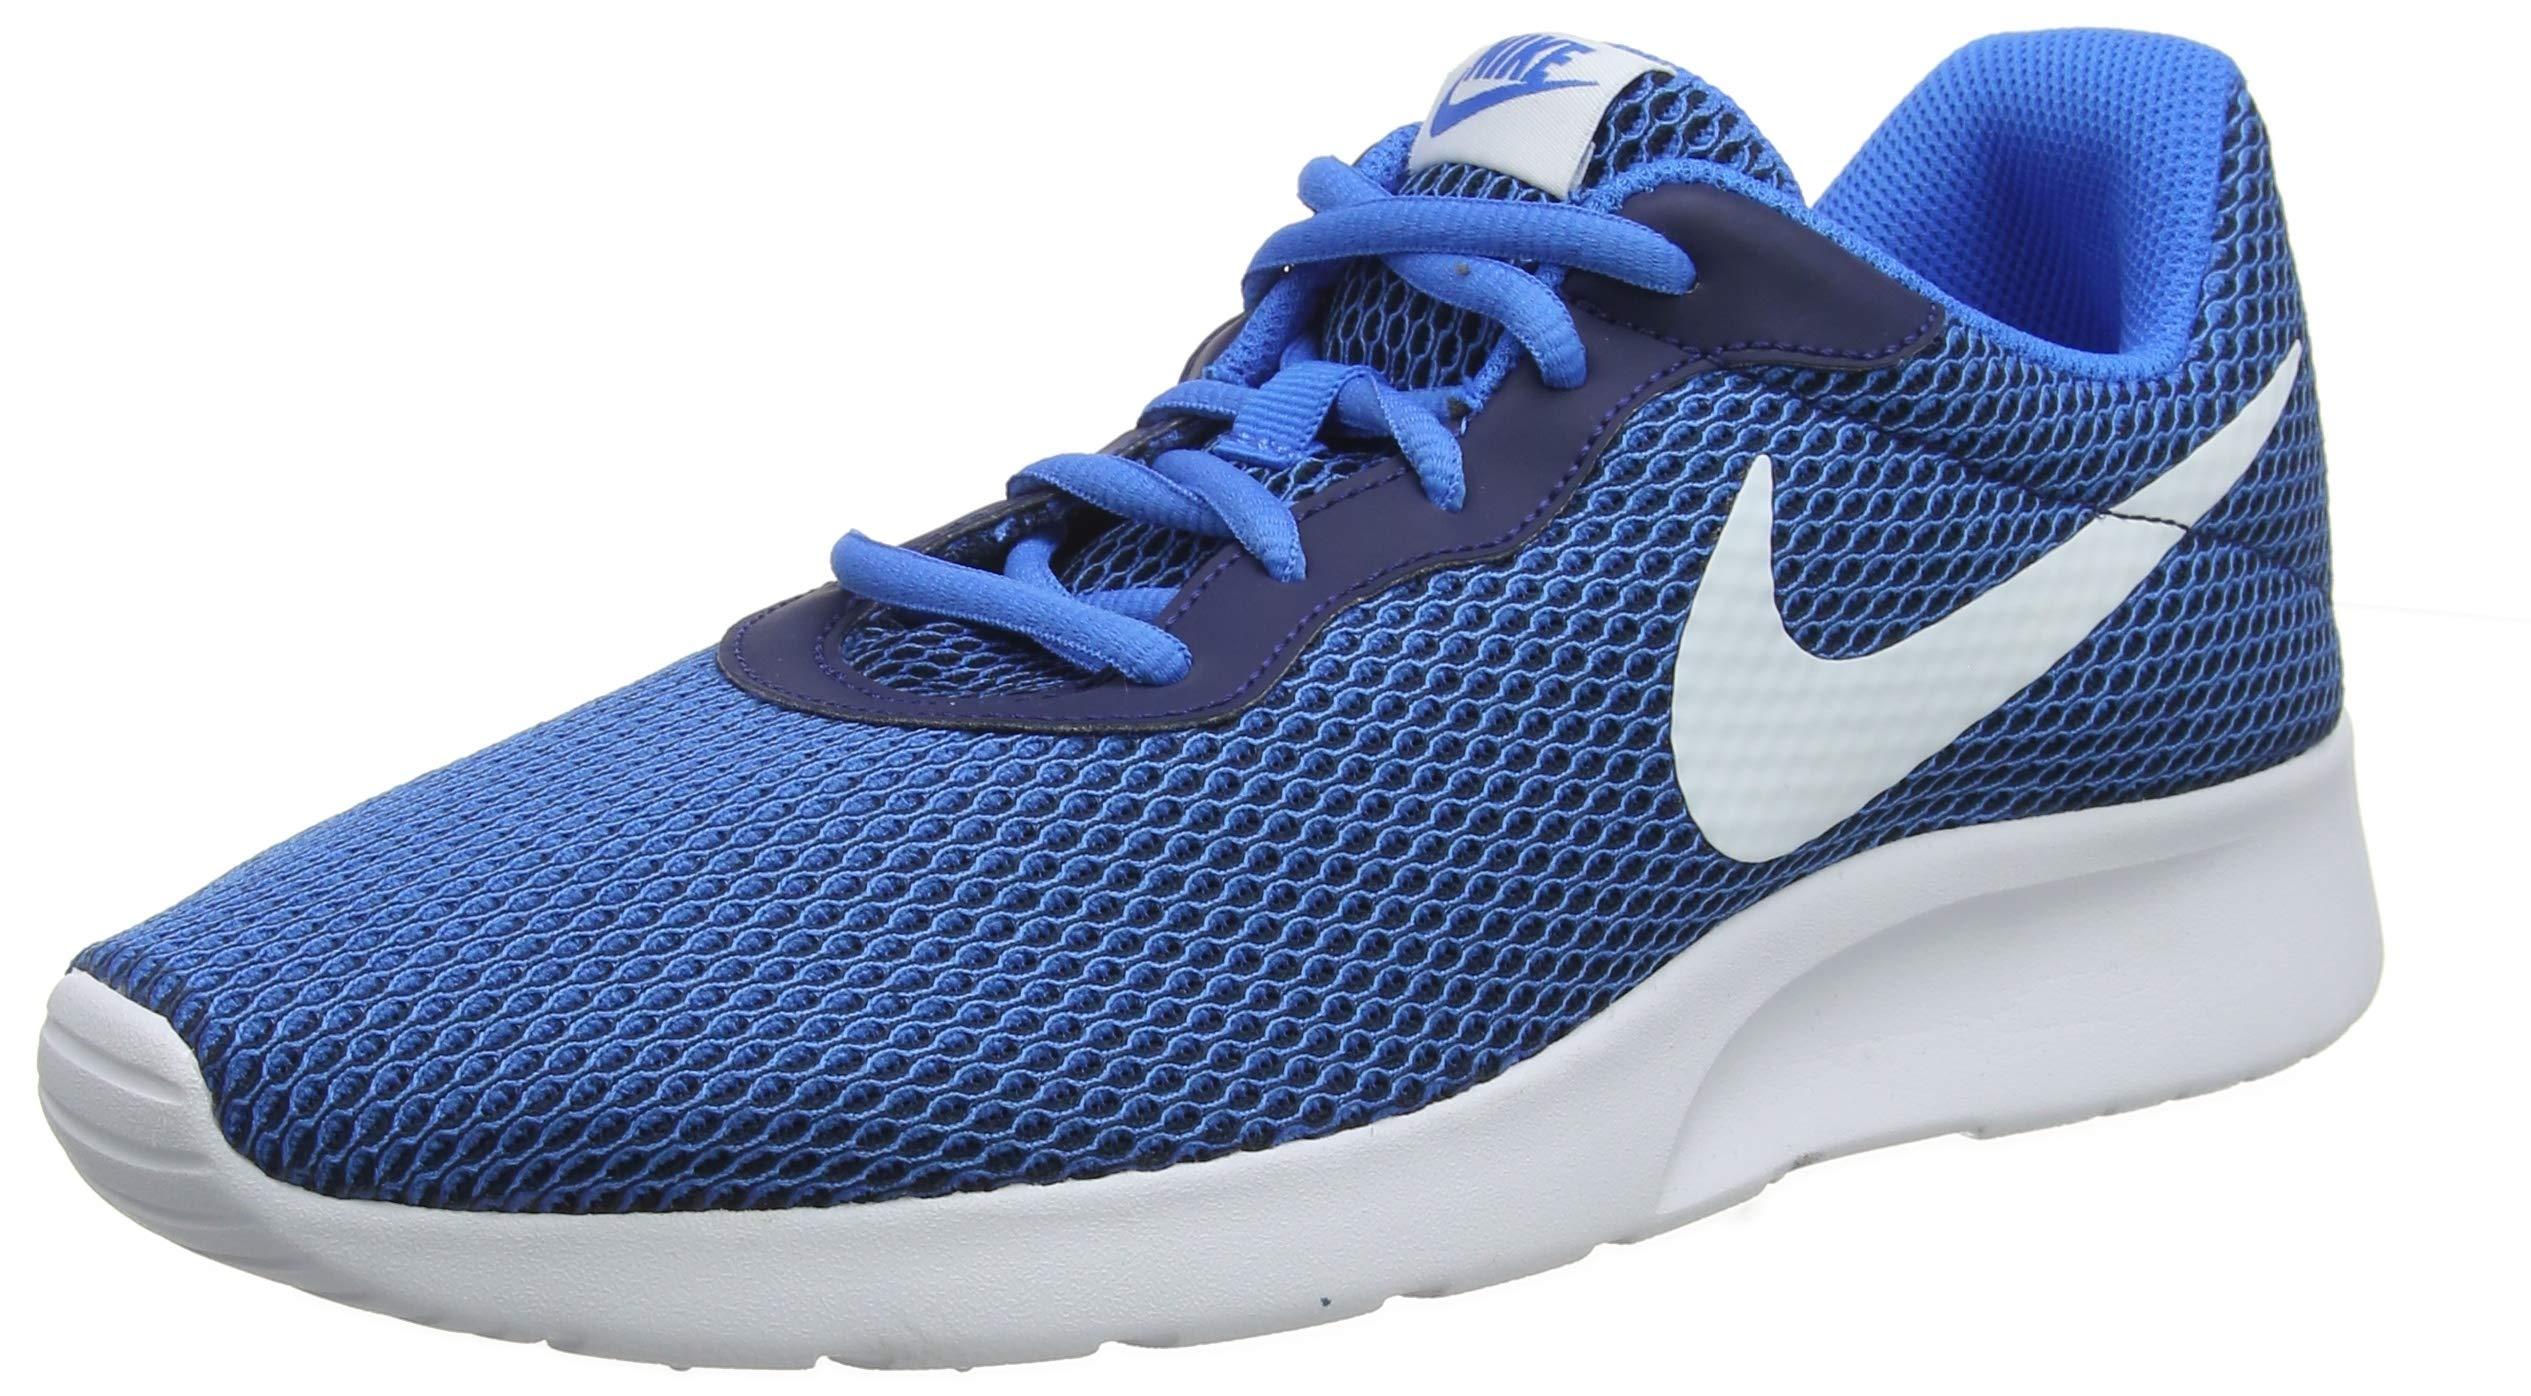 Nike Mens Tanjun Se Low Top Lace Up Running, White-Blue-Navy Blue, Size 11.0